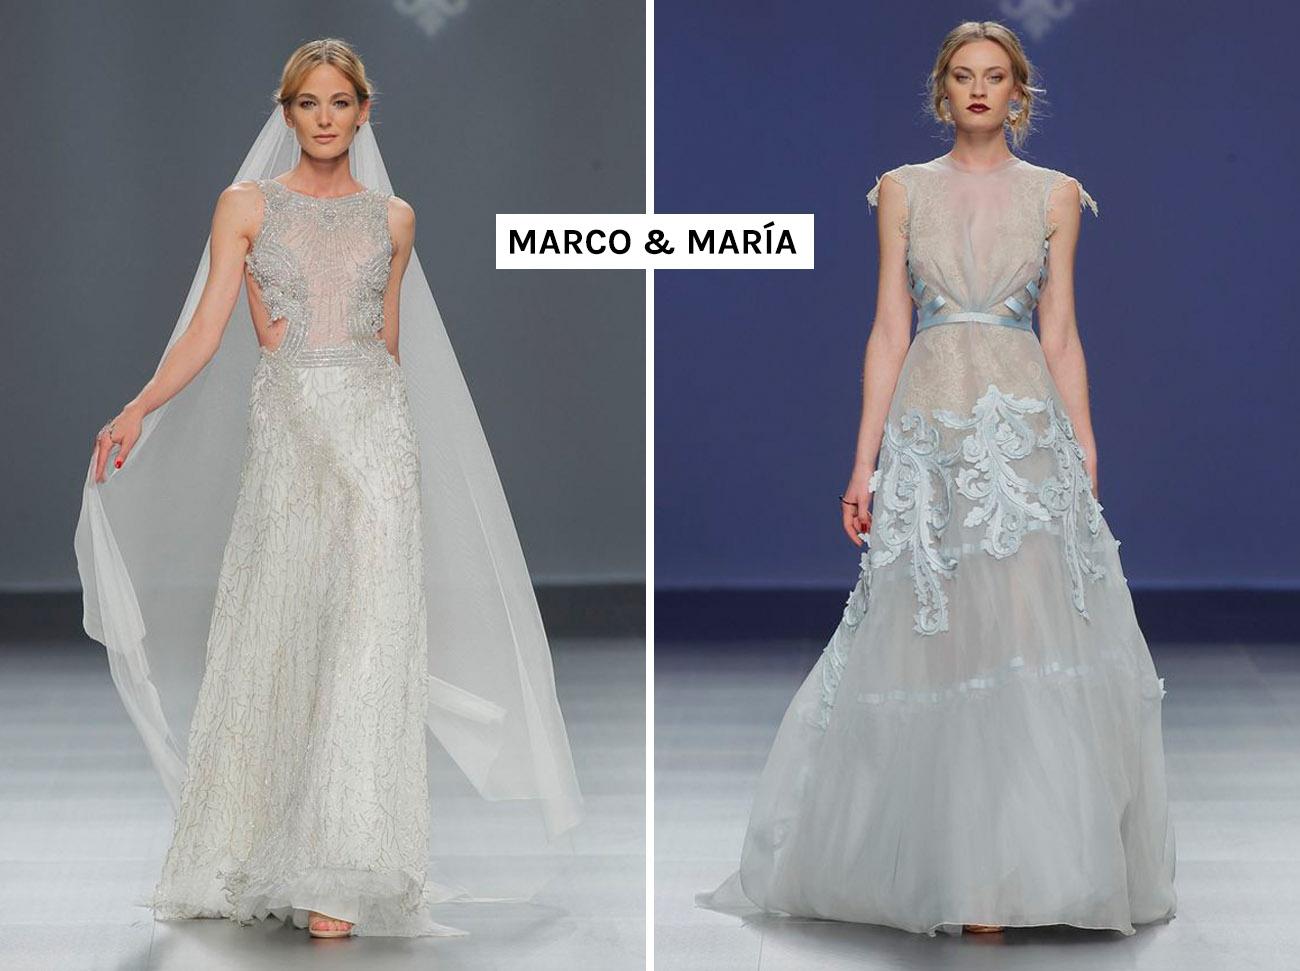 MARCO & MARIA wedding Dresses